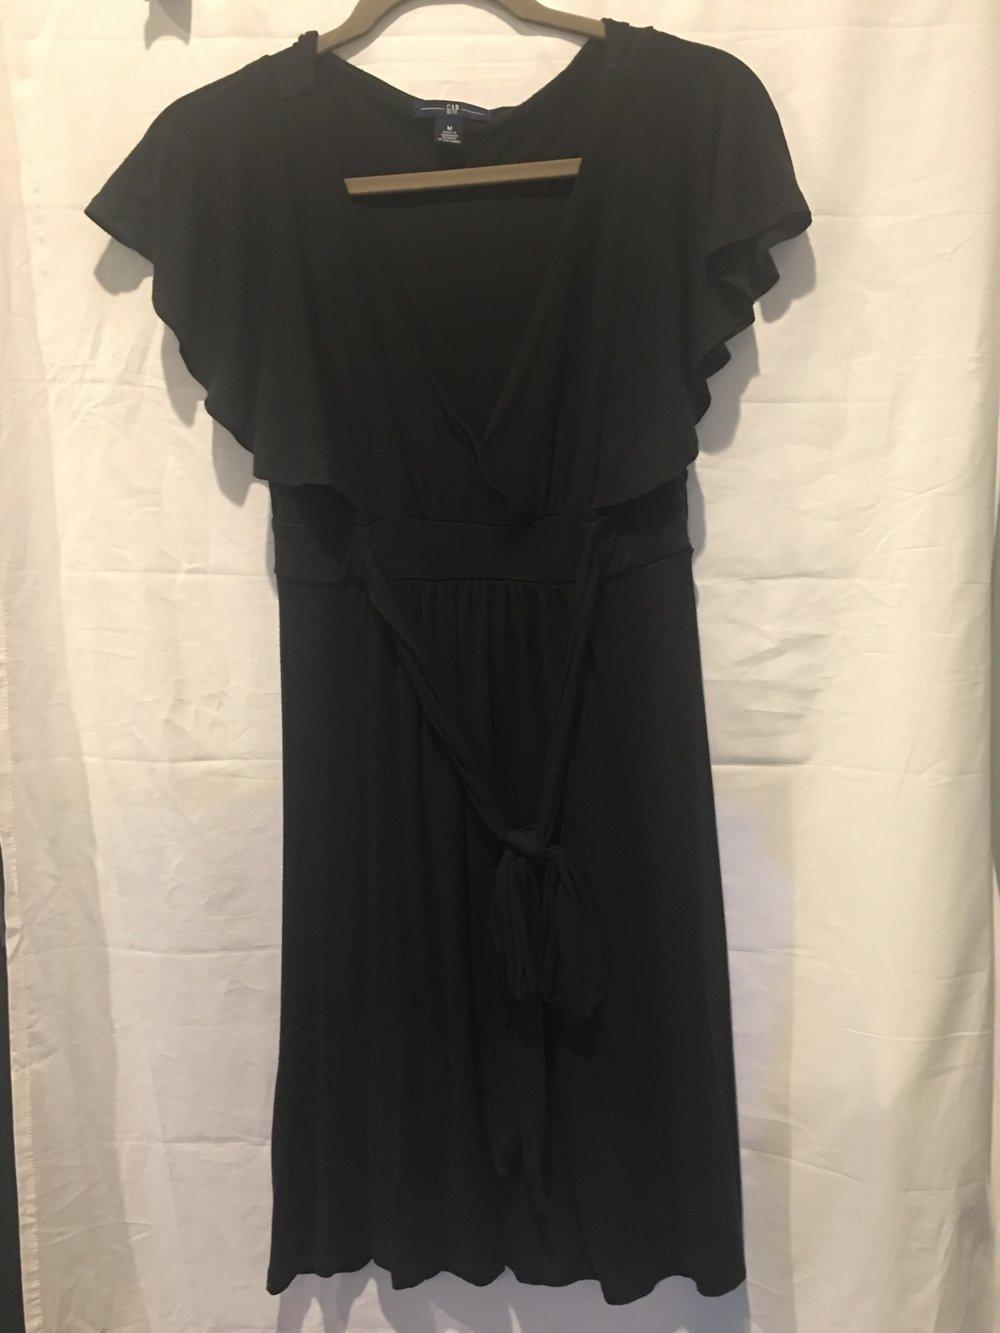 Gap V-Neck Ruffle Black Dress.jpg